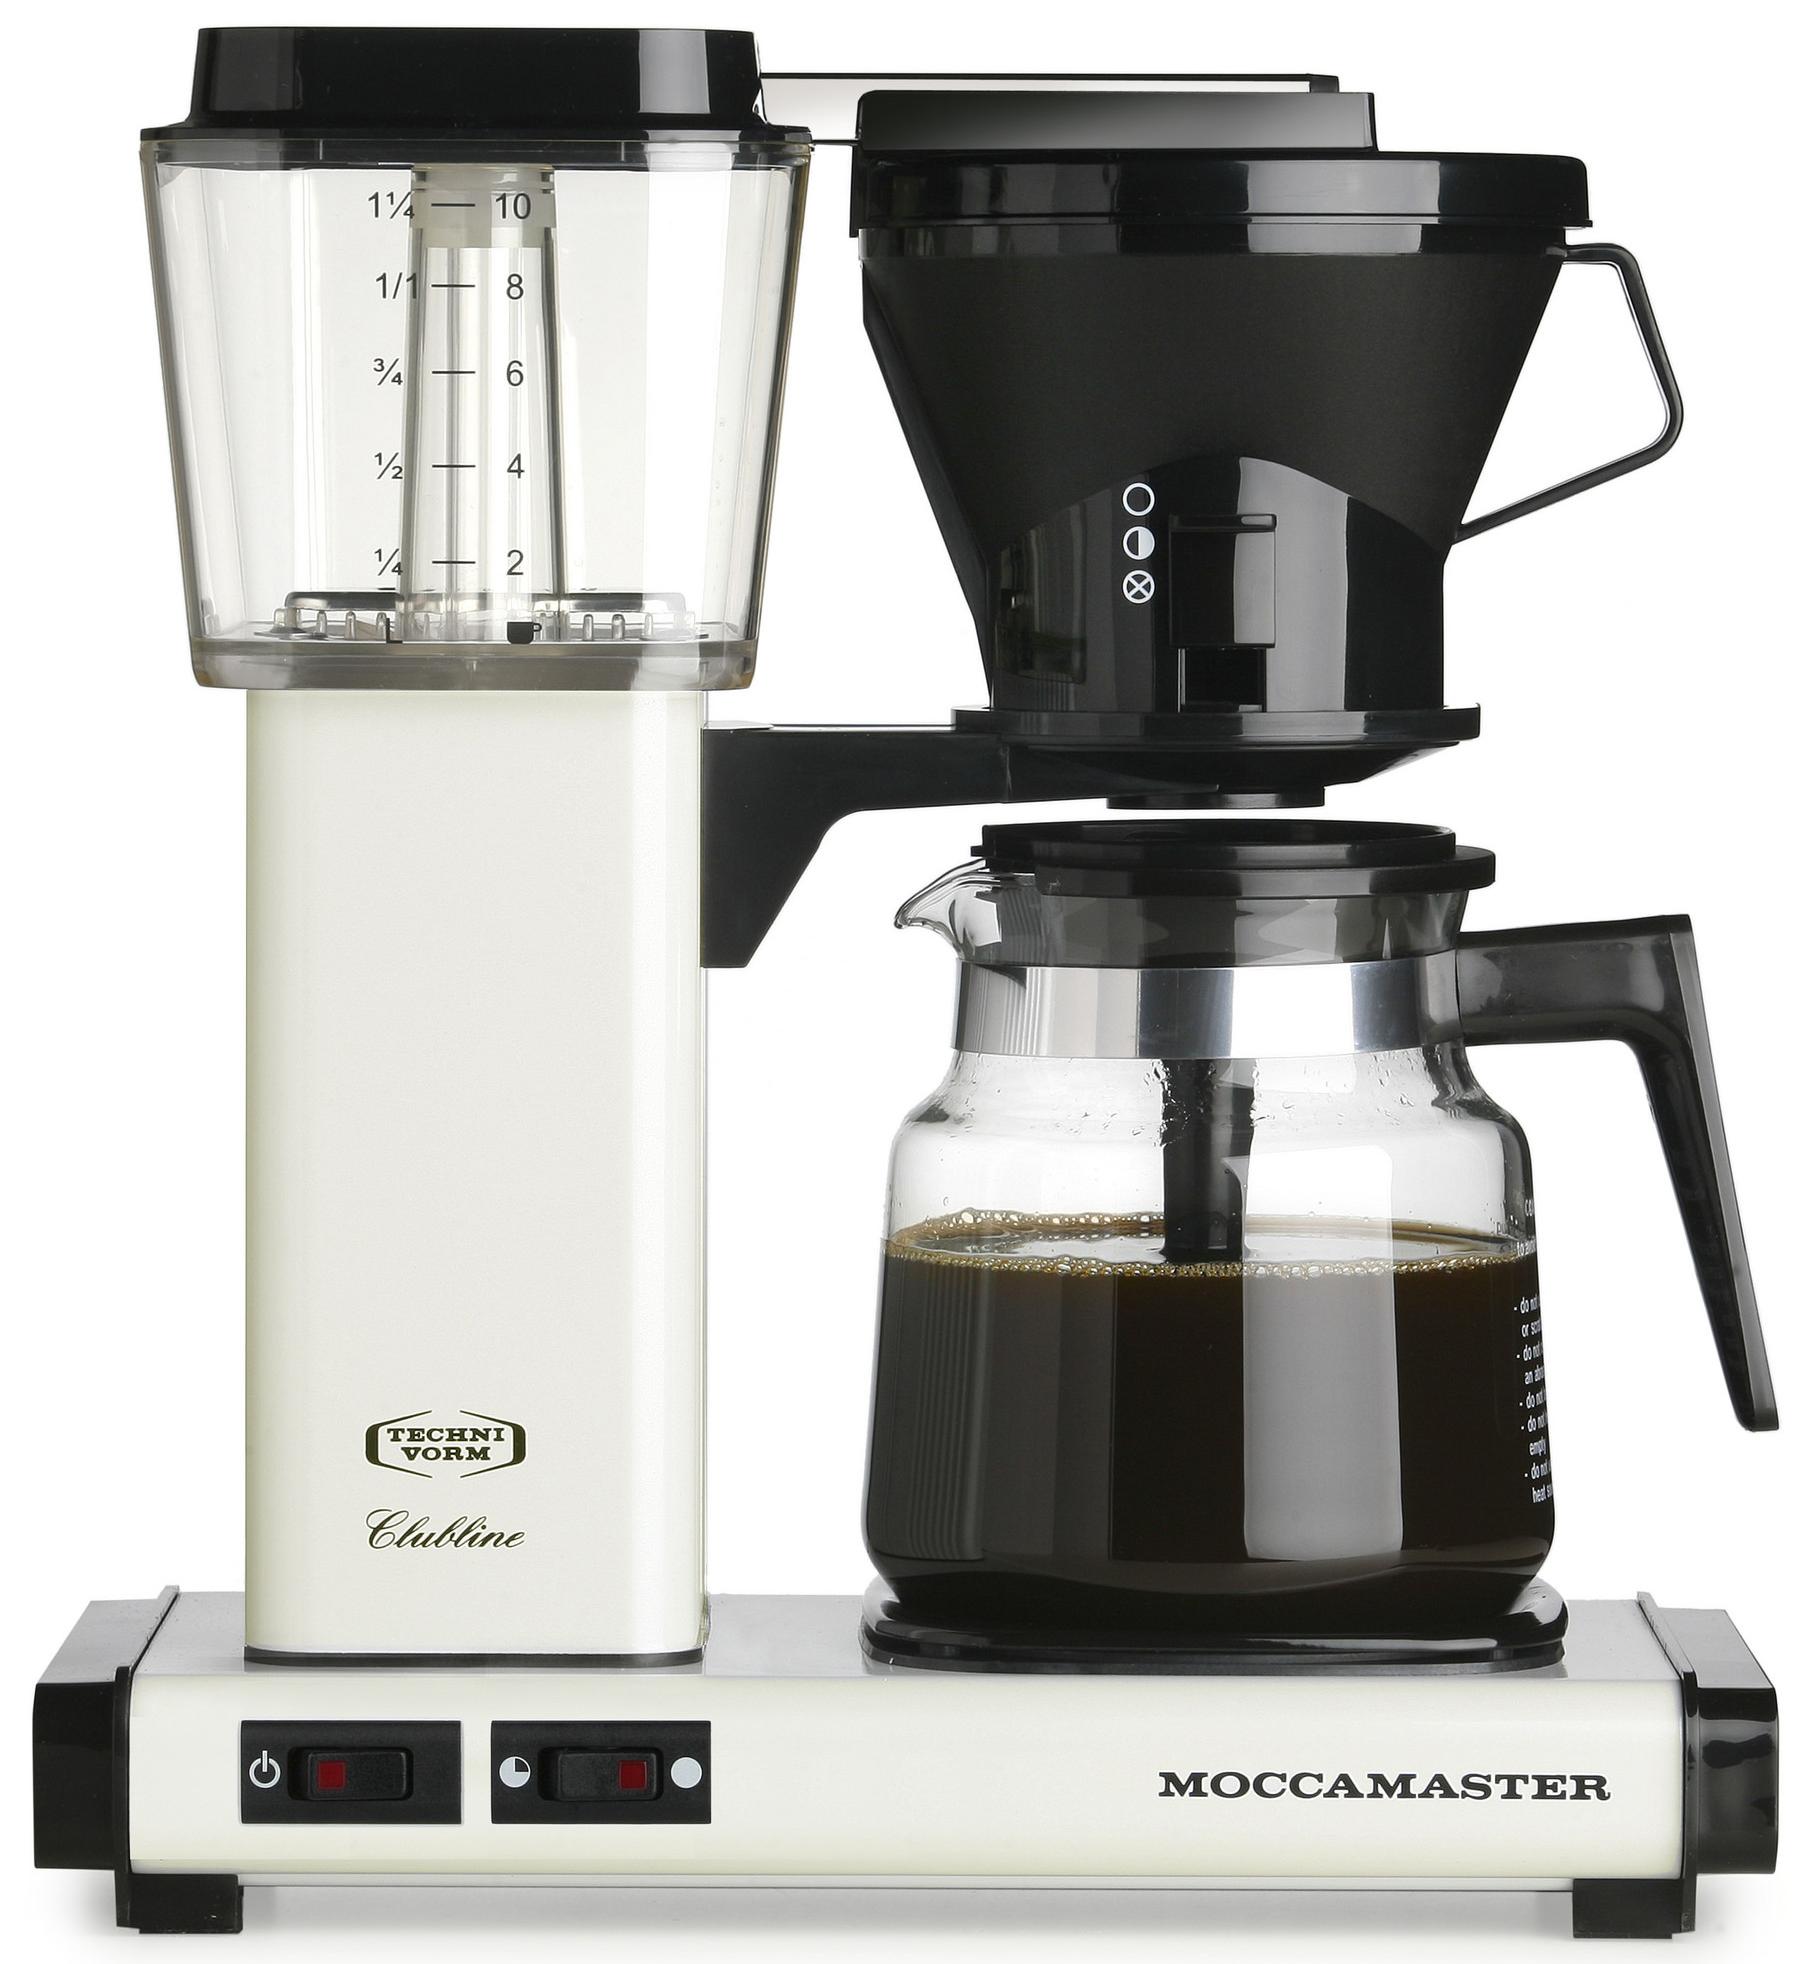 Moccamaster Kaffebryggare KB952AO Cream